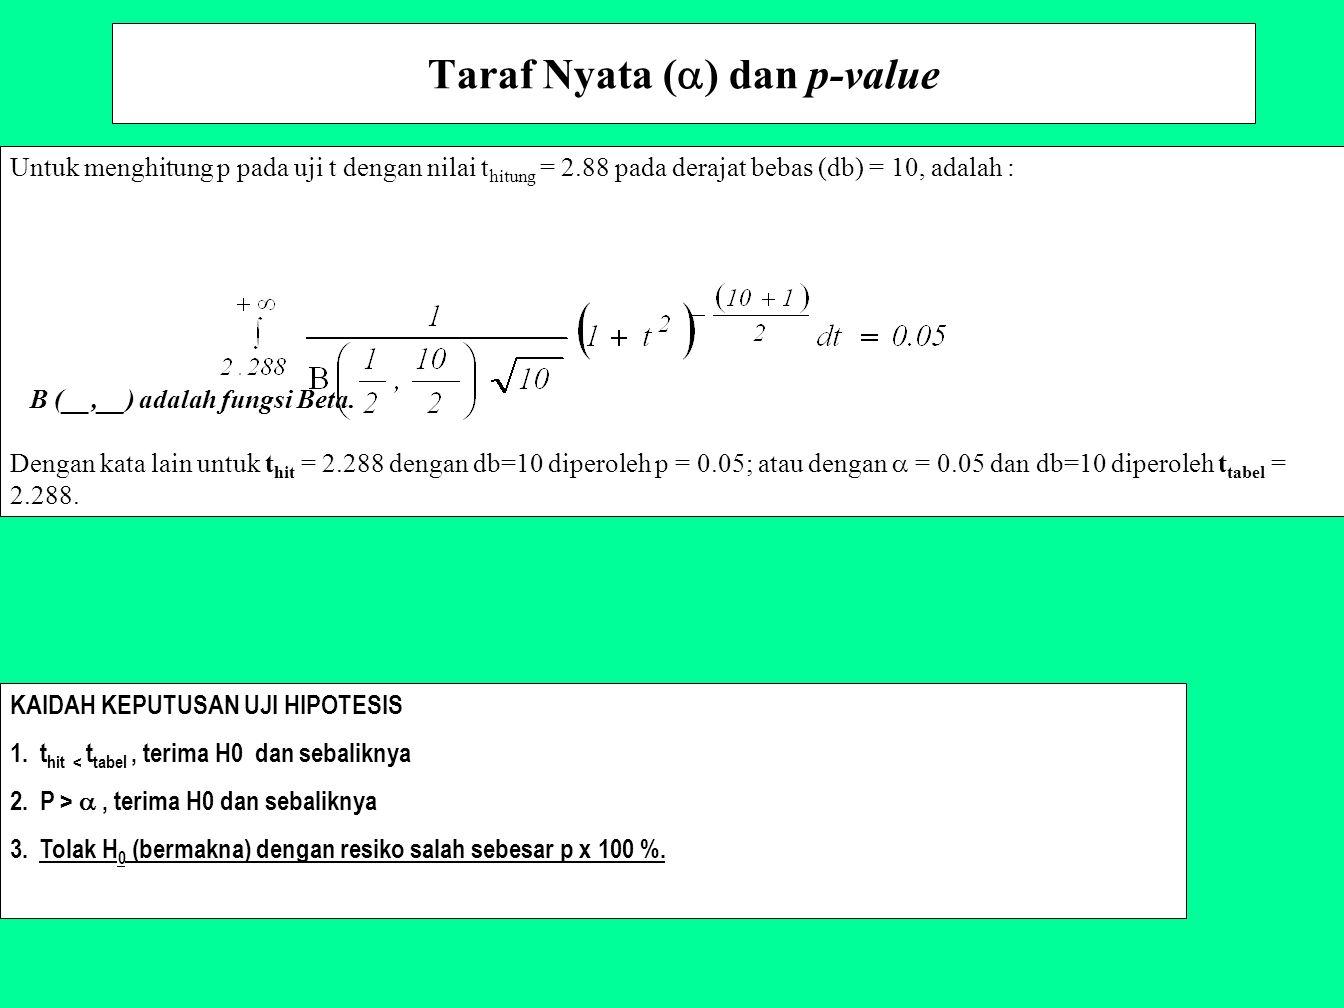 Taraf Nyata (  ) dan p-value Untuk menghitung p pada uji t dengan nilai t hitung = 2.88 pada derajat bebas (db) = 10, adalah : B (__,__) adalah fungs